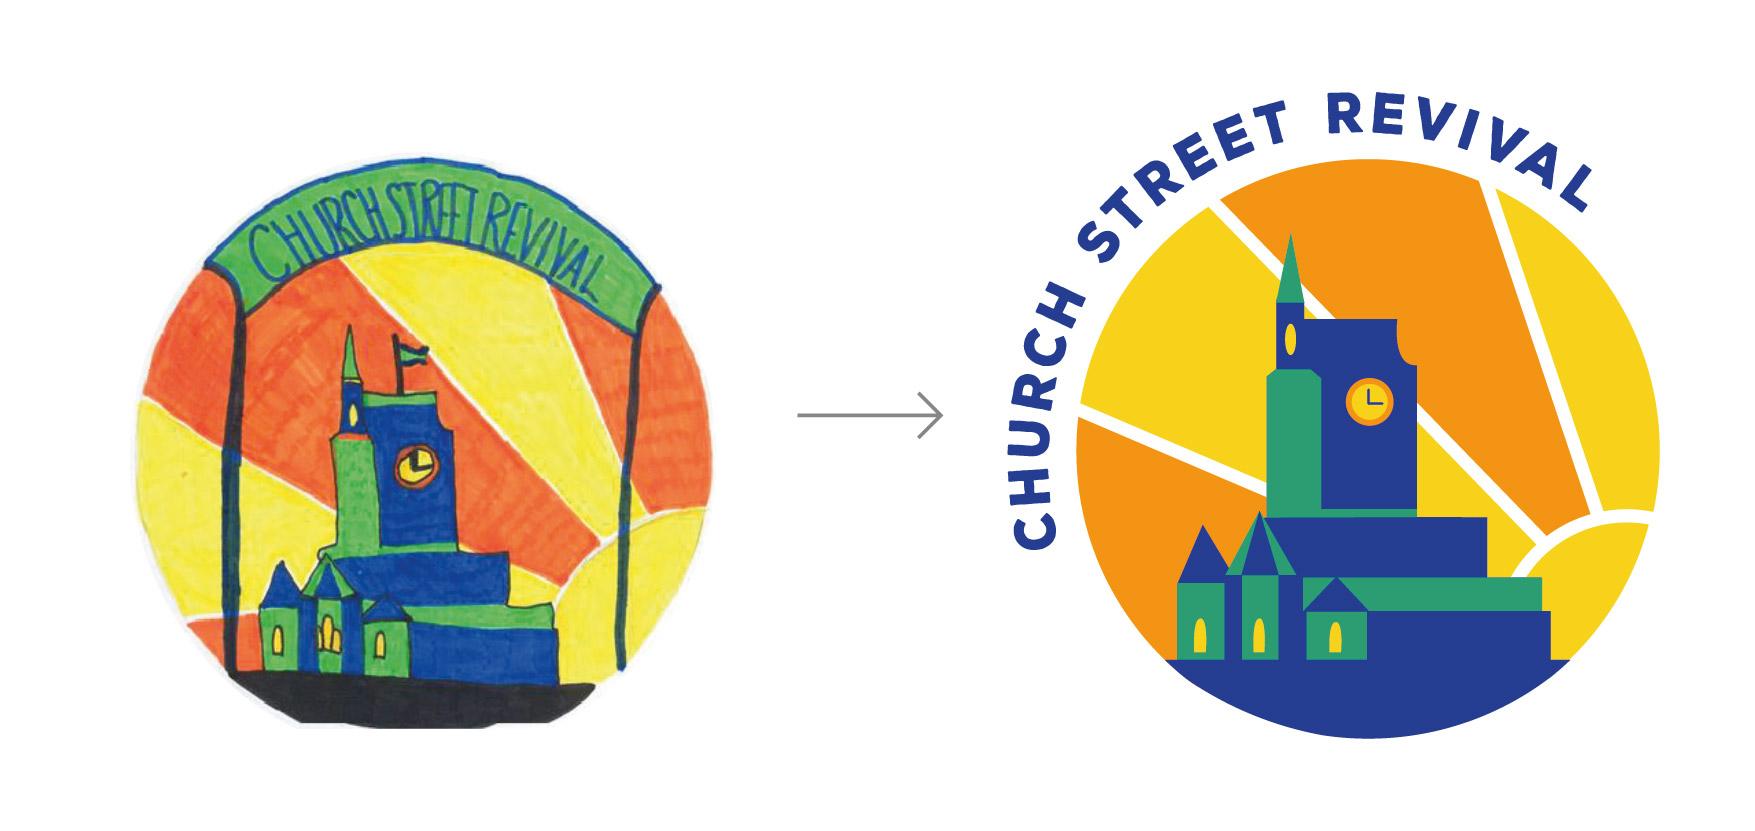 Church Street Revival Logo Options2-08.jpg